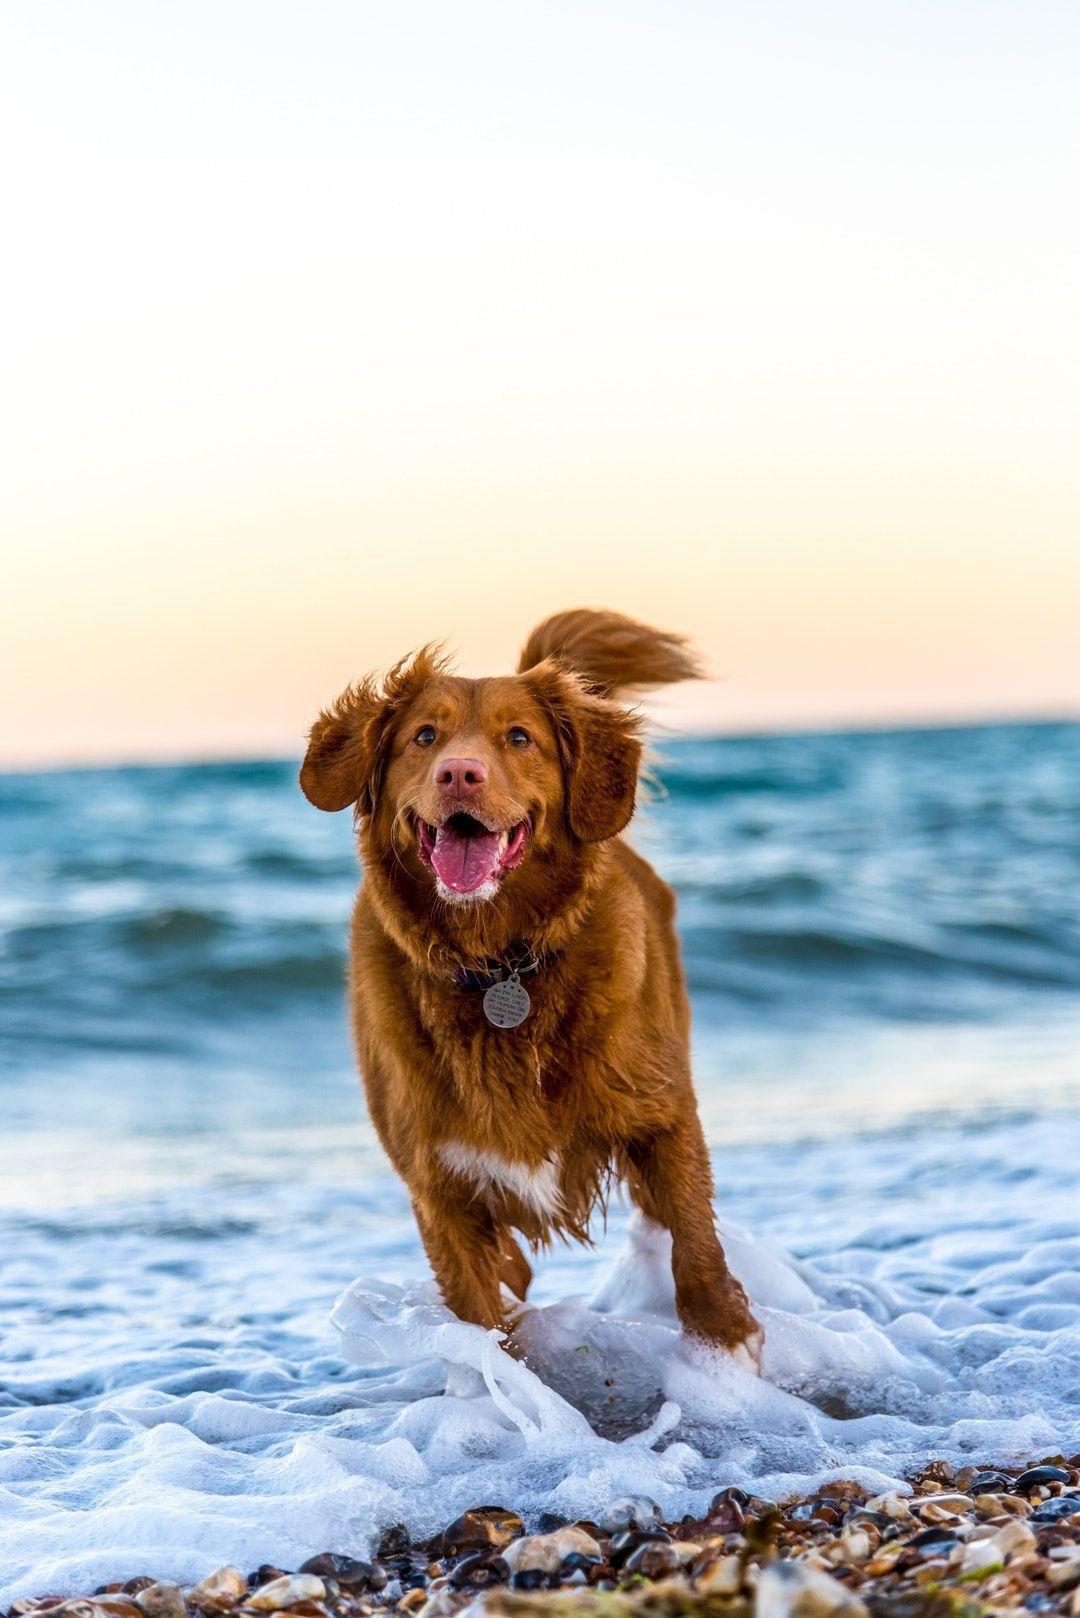 dog behavior training classes near me in 2020 Dog beach